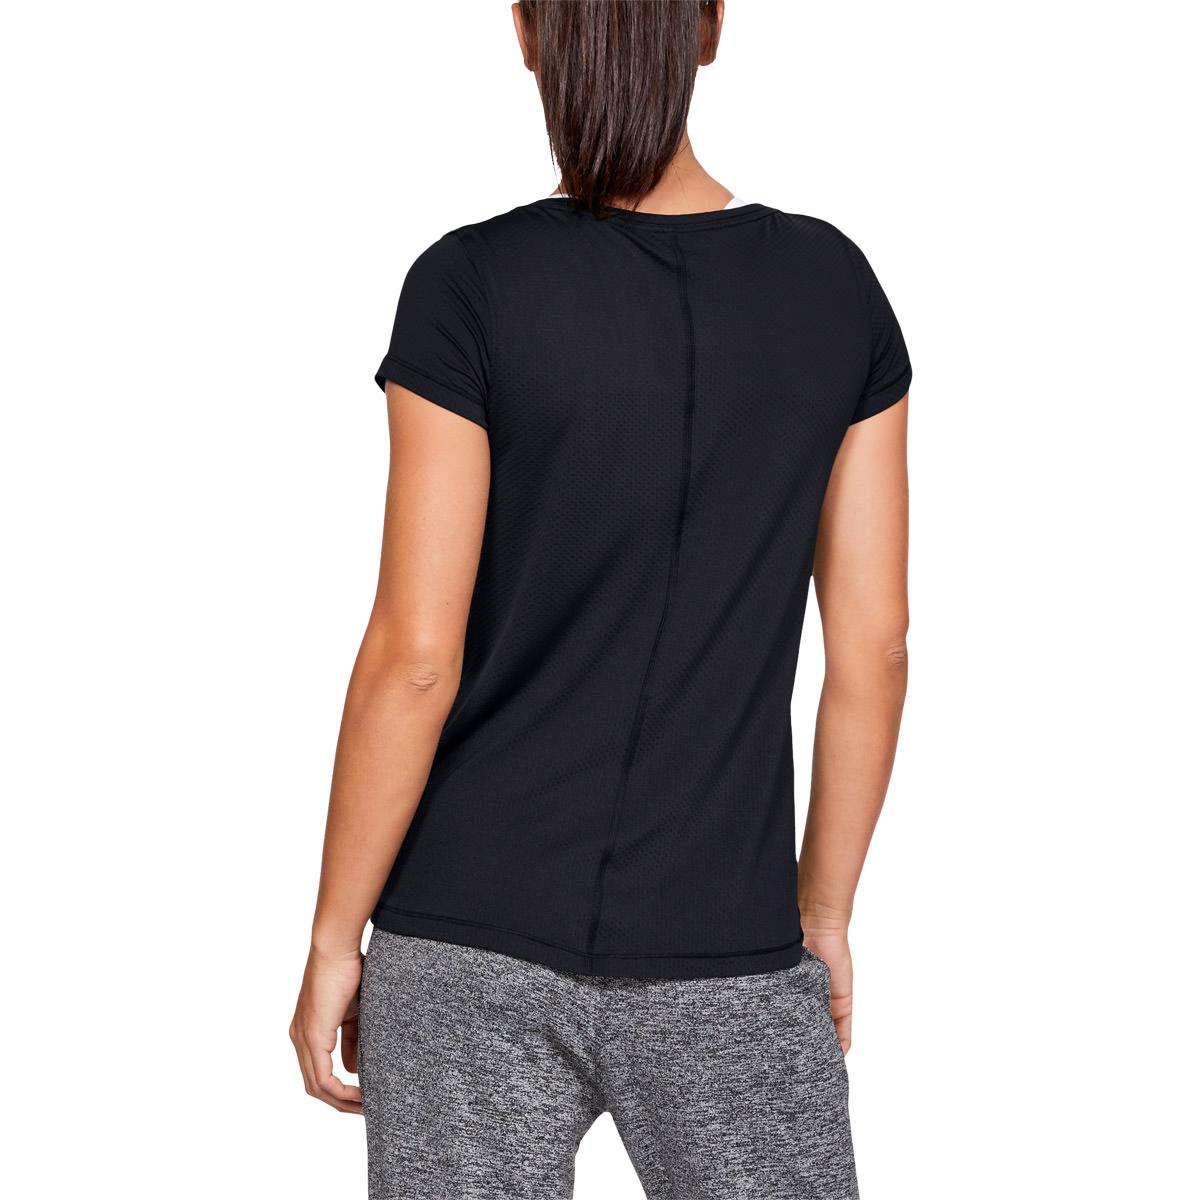 Under Armour Heat Gear Armour Trænings T-shirt Dame